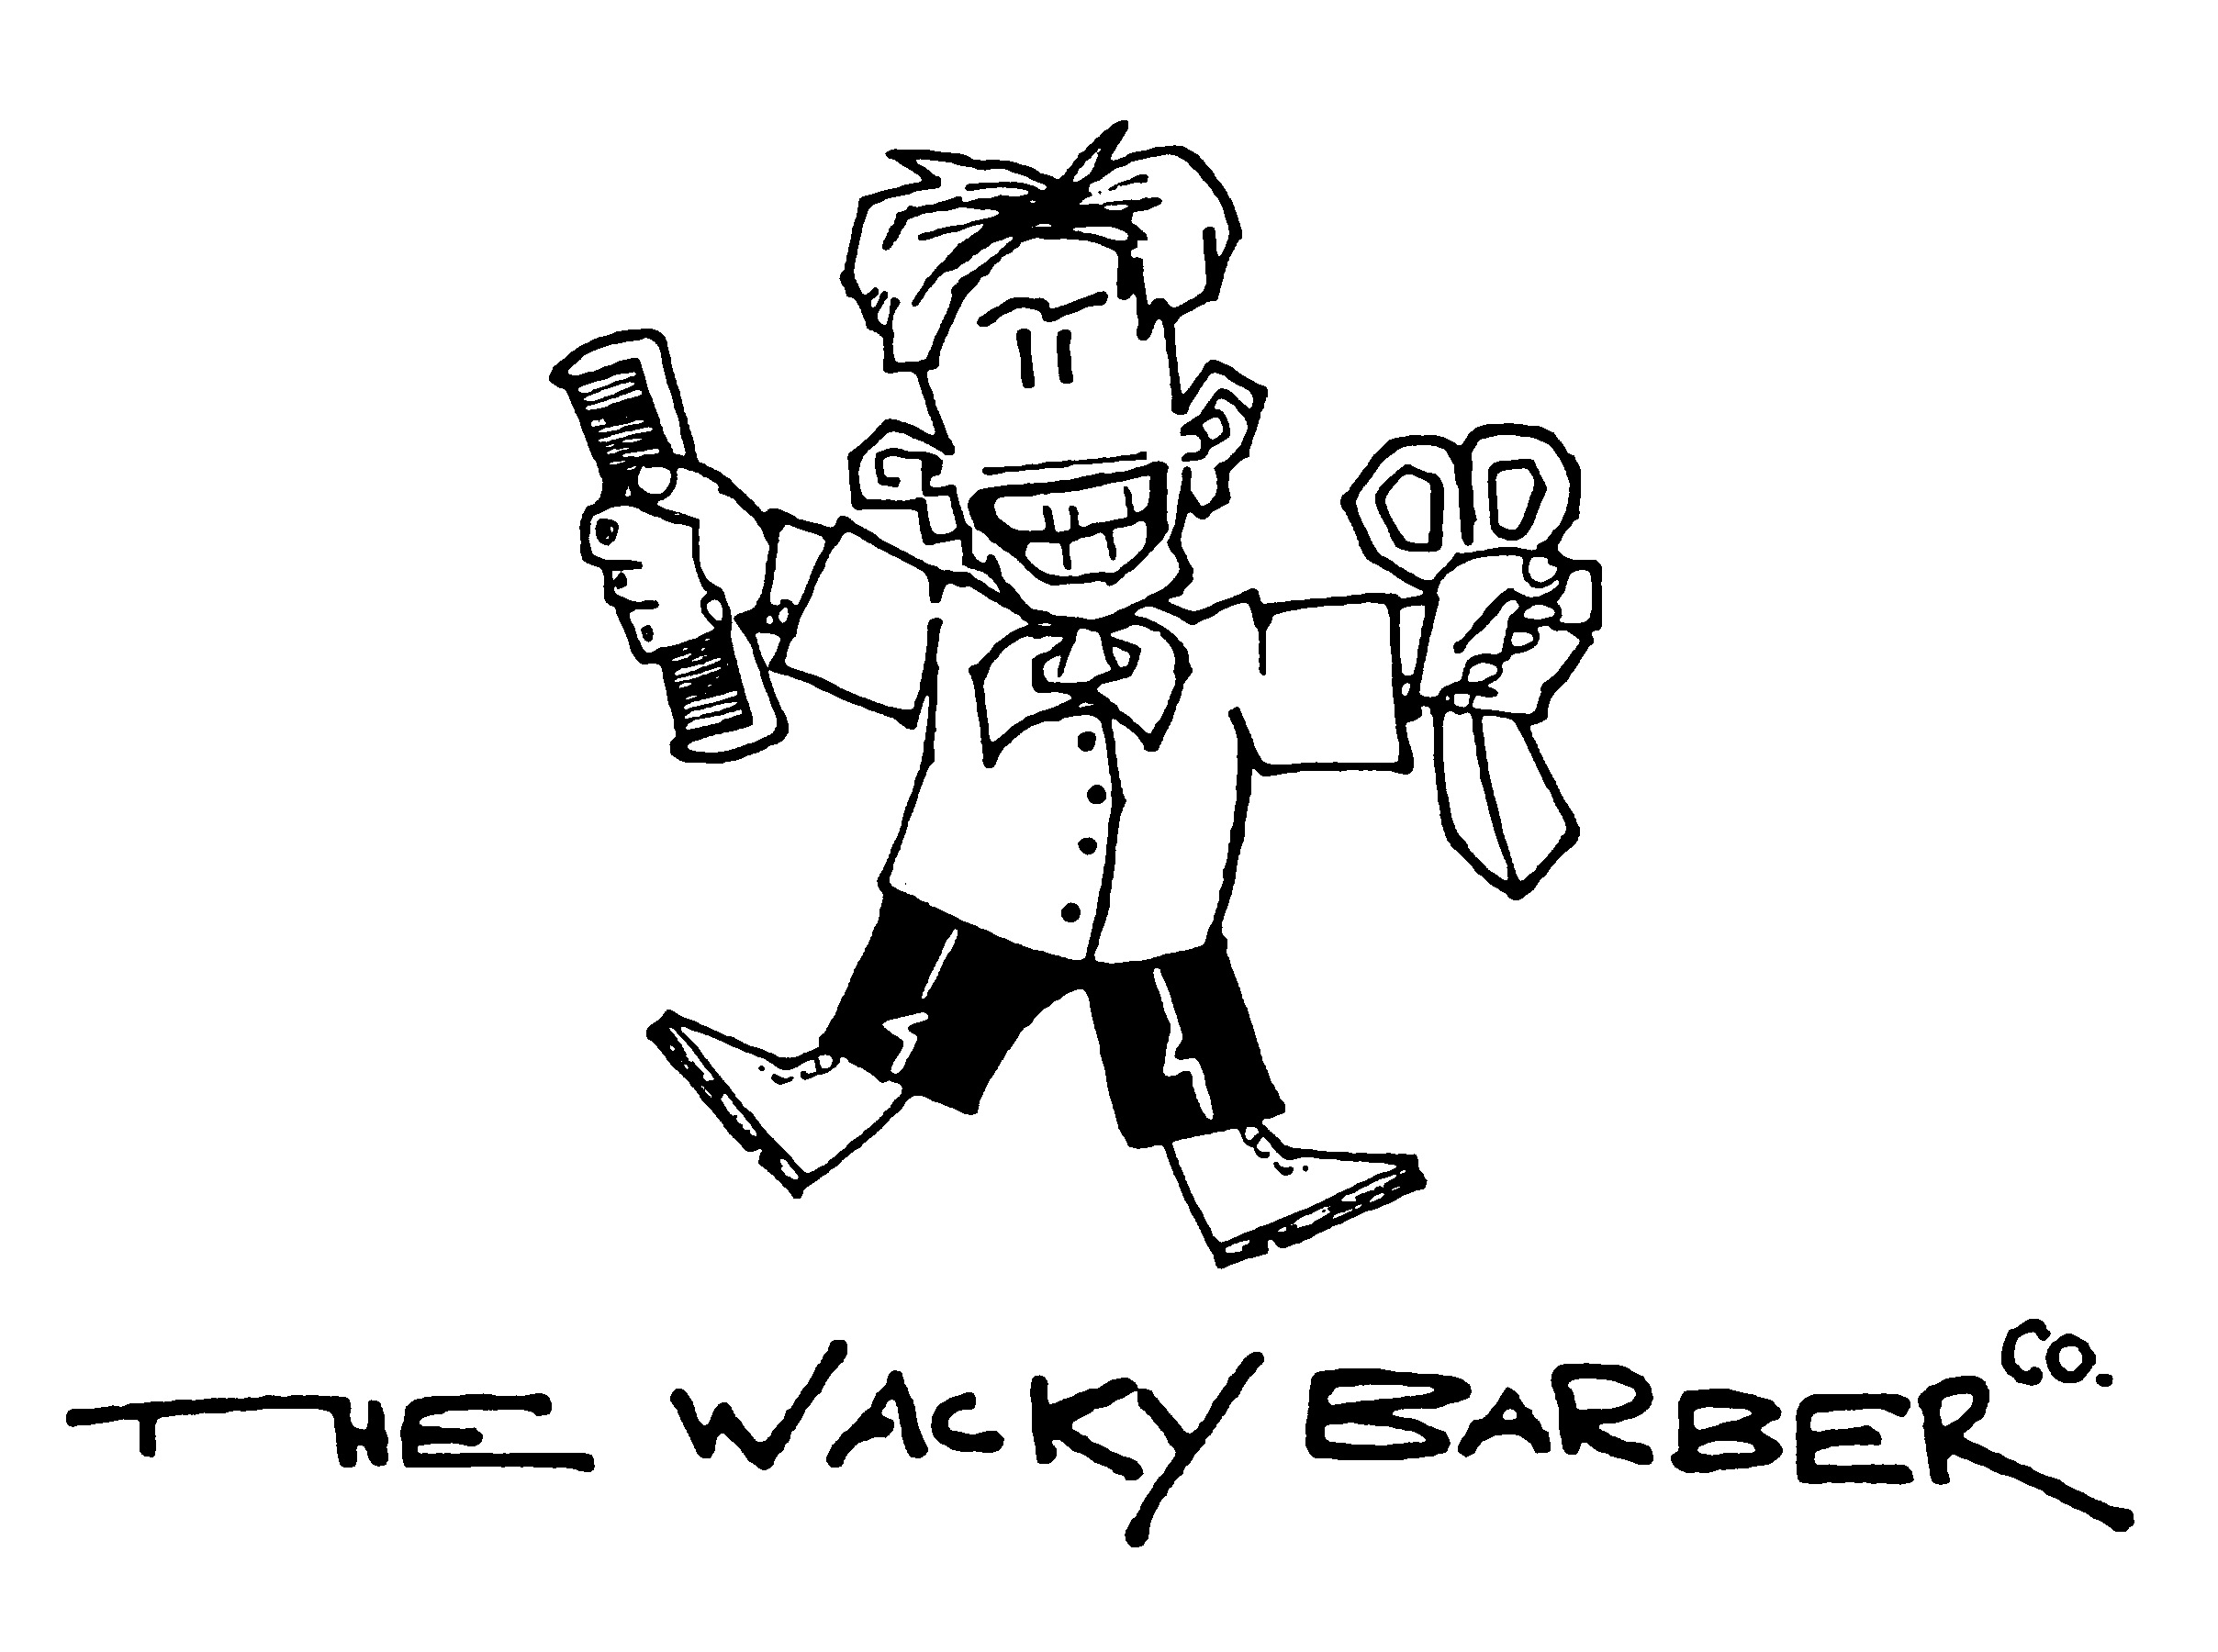 Wacky Barbers